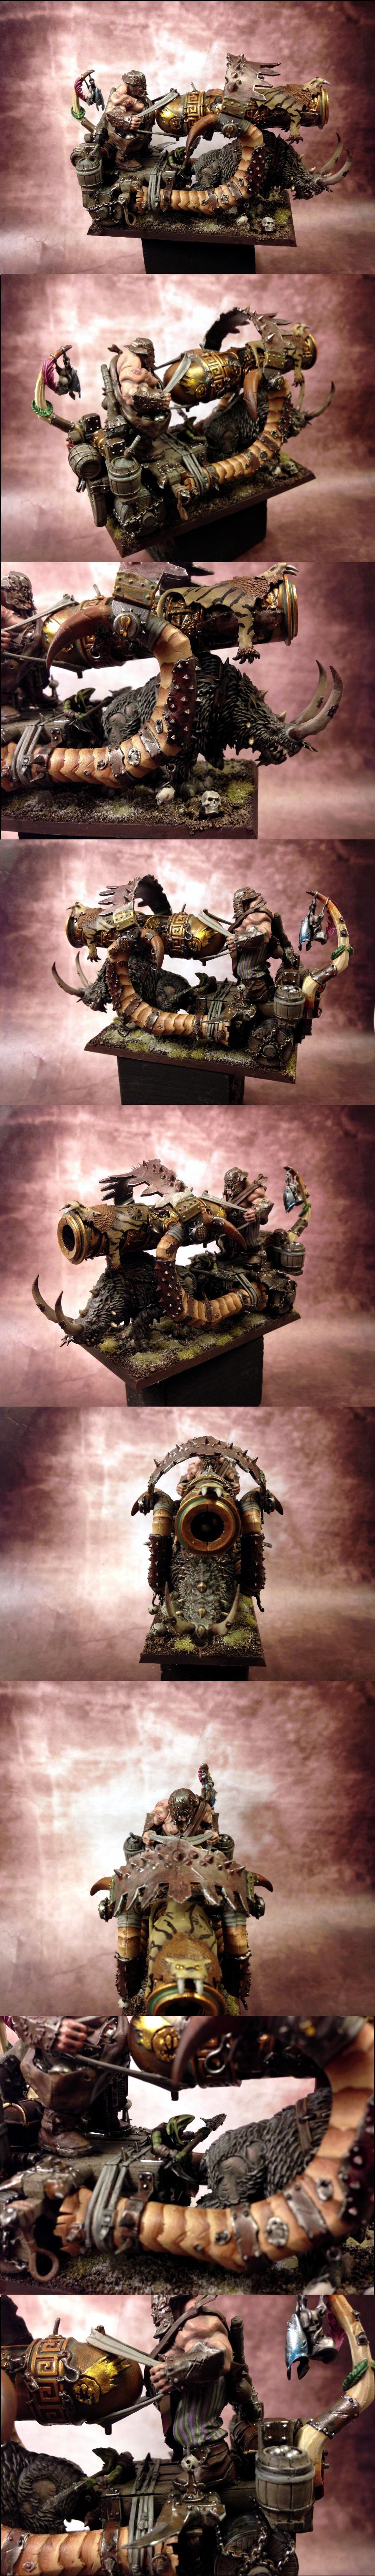 Aosol, Iron Blaster, Ogre Kingdoms, Ogres, Warhammer Fantasy